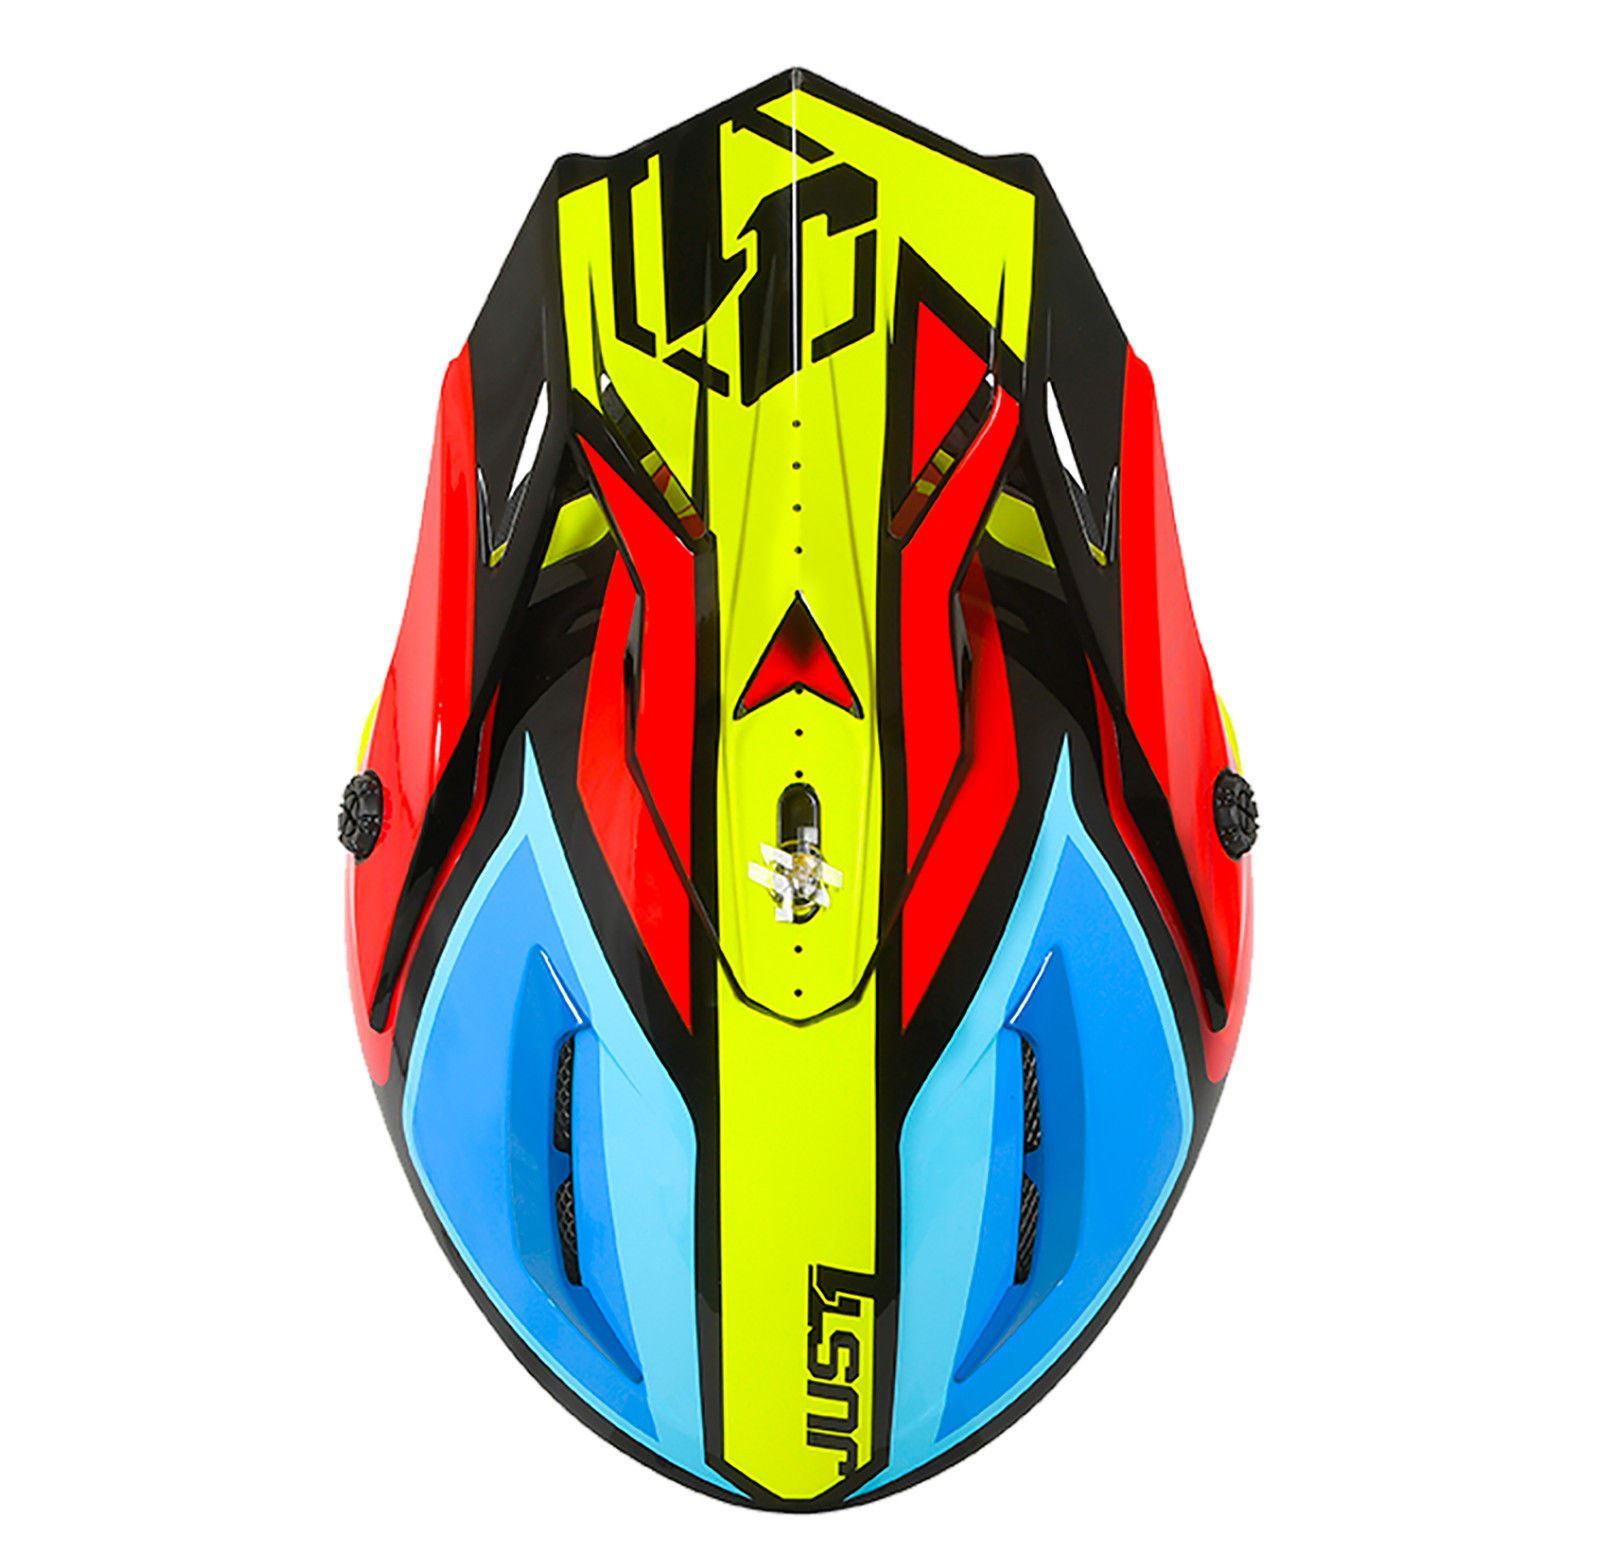 Just1-J38-Blade-Helmet-Motocross-Enduro-MX-ATV-Motorcycle-Off-Road-Full-Face-ACU thumbnail 14